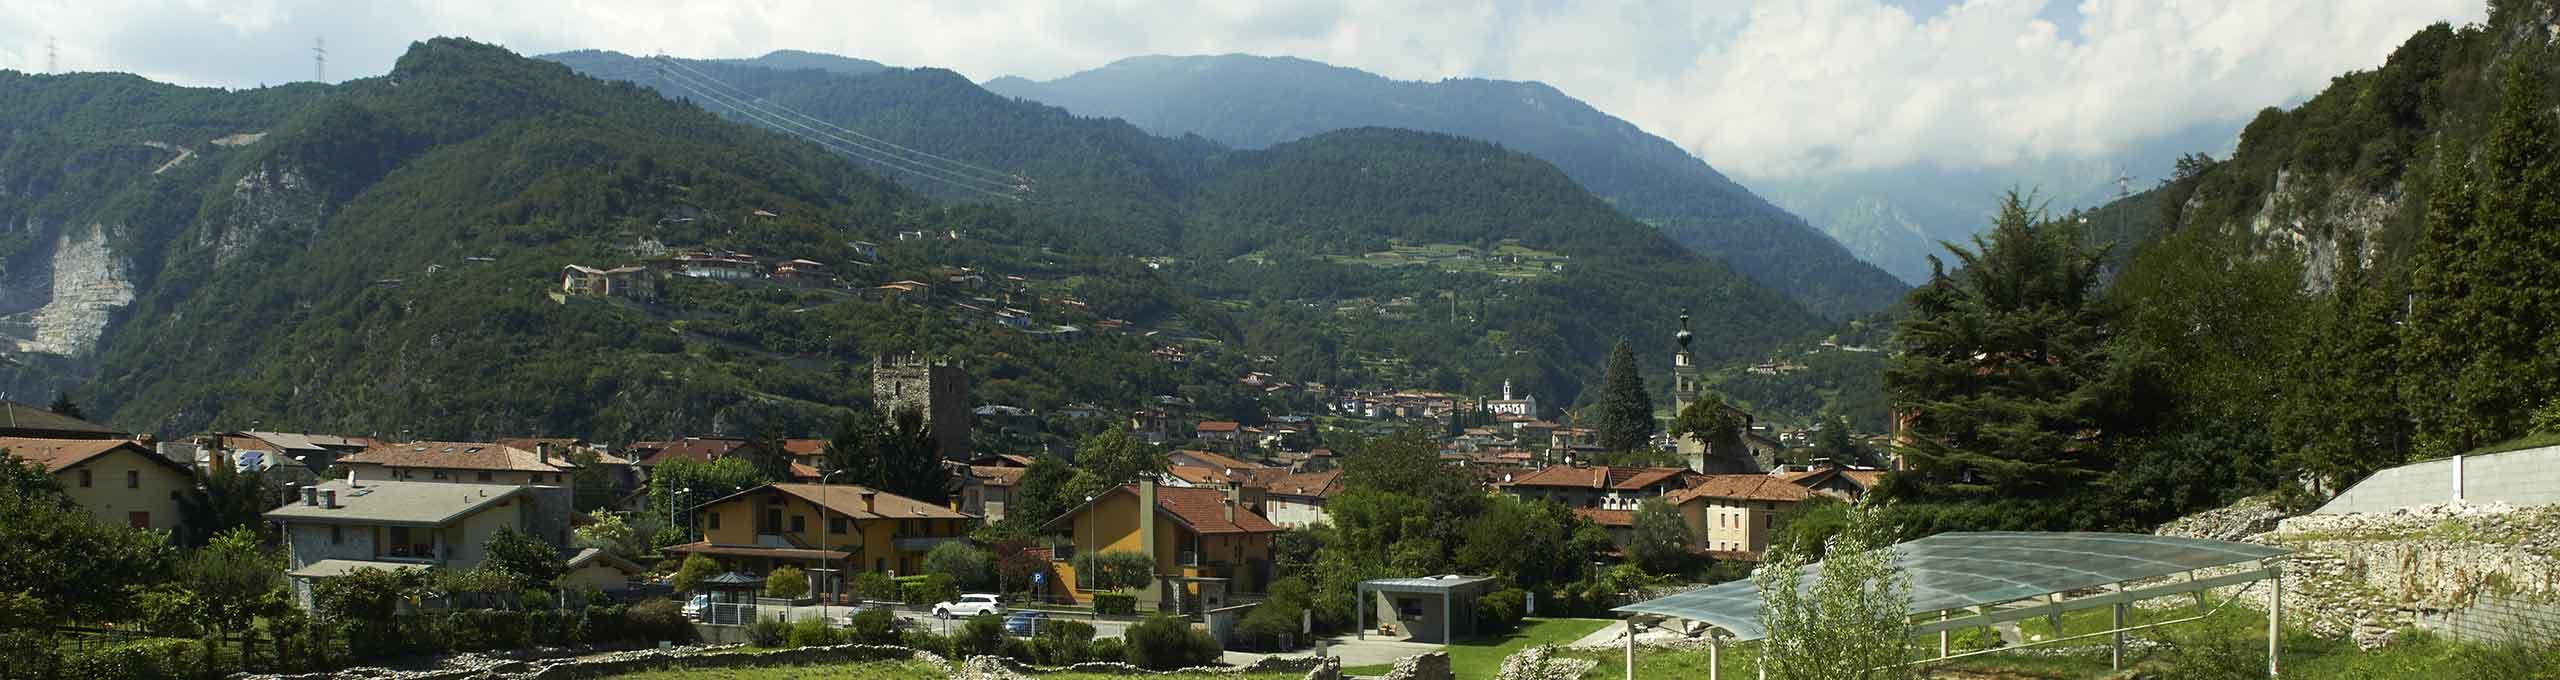 Cividate Camuno, Val Camonica